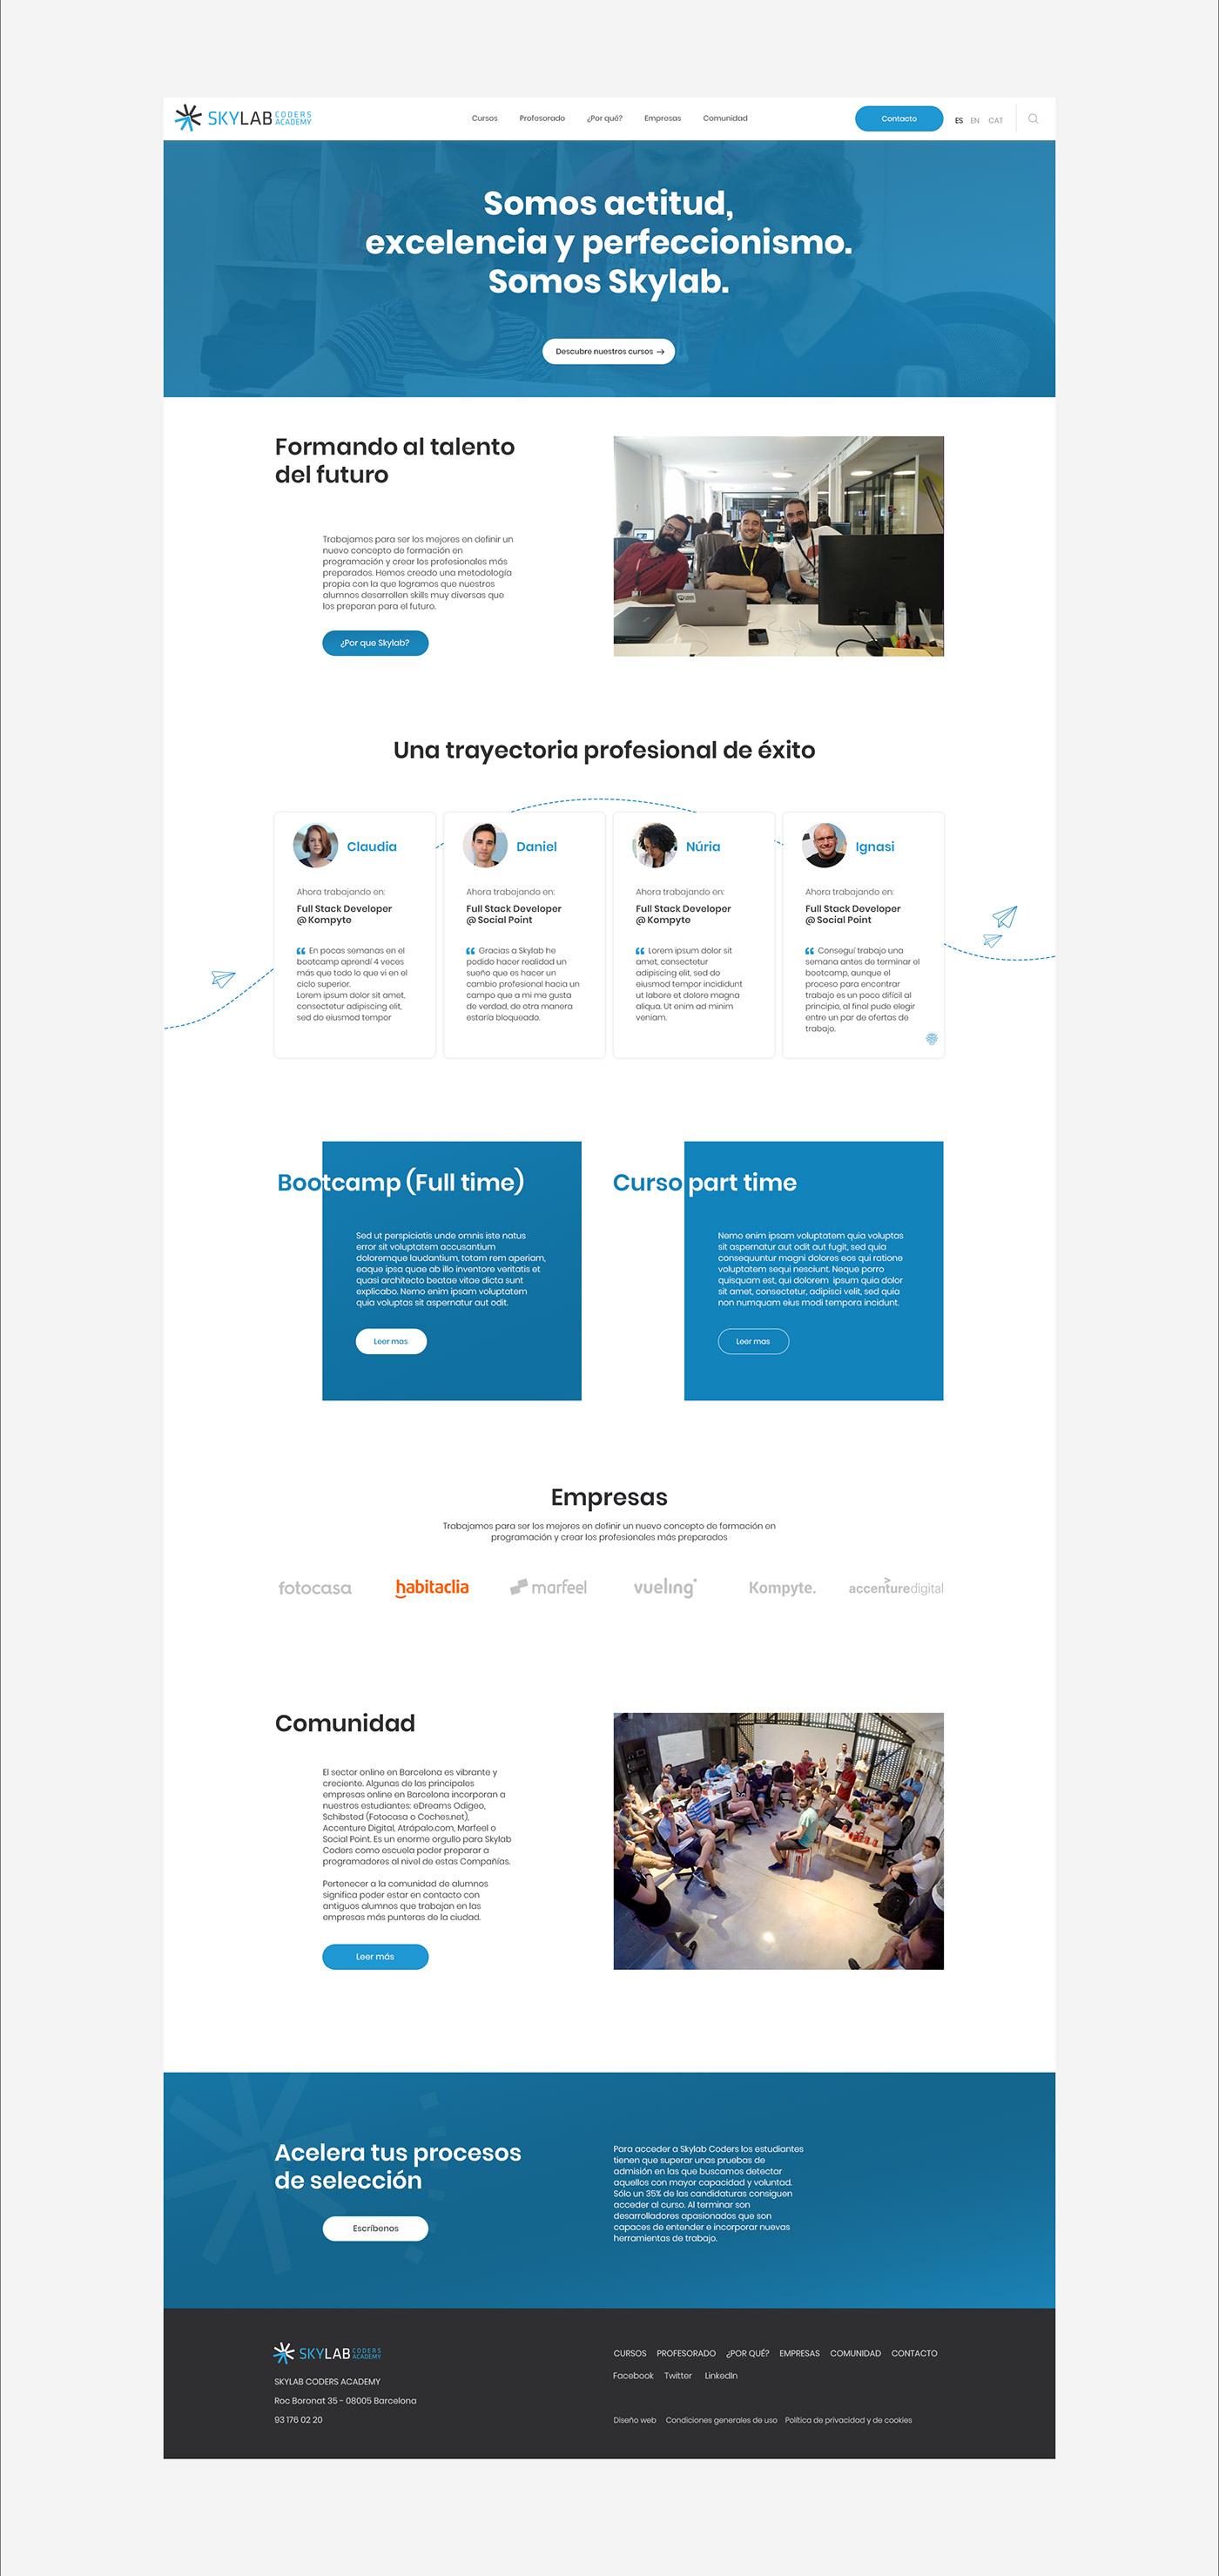 academy Coders coursed digital art direction digital design ui design visual design Web Design